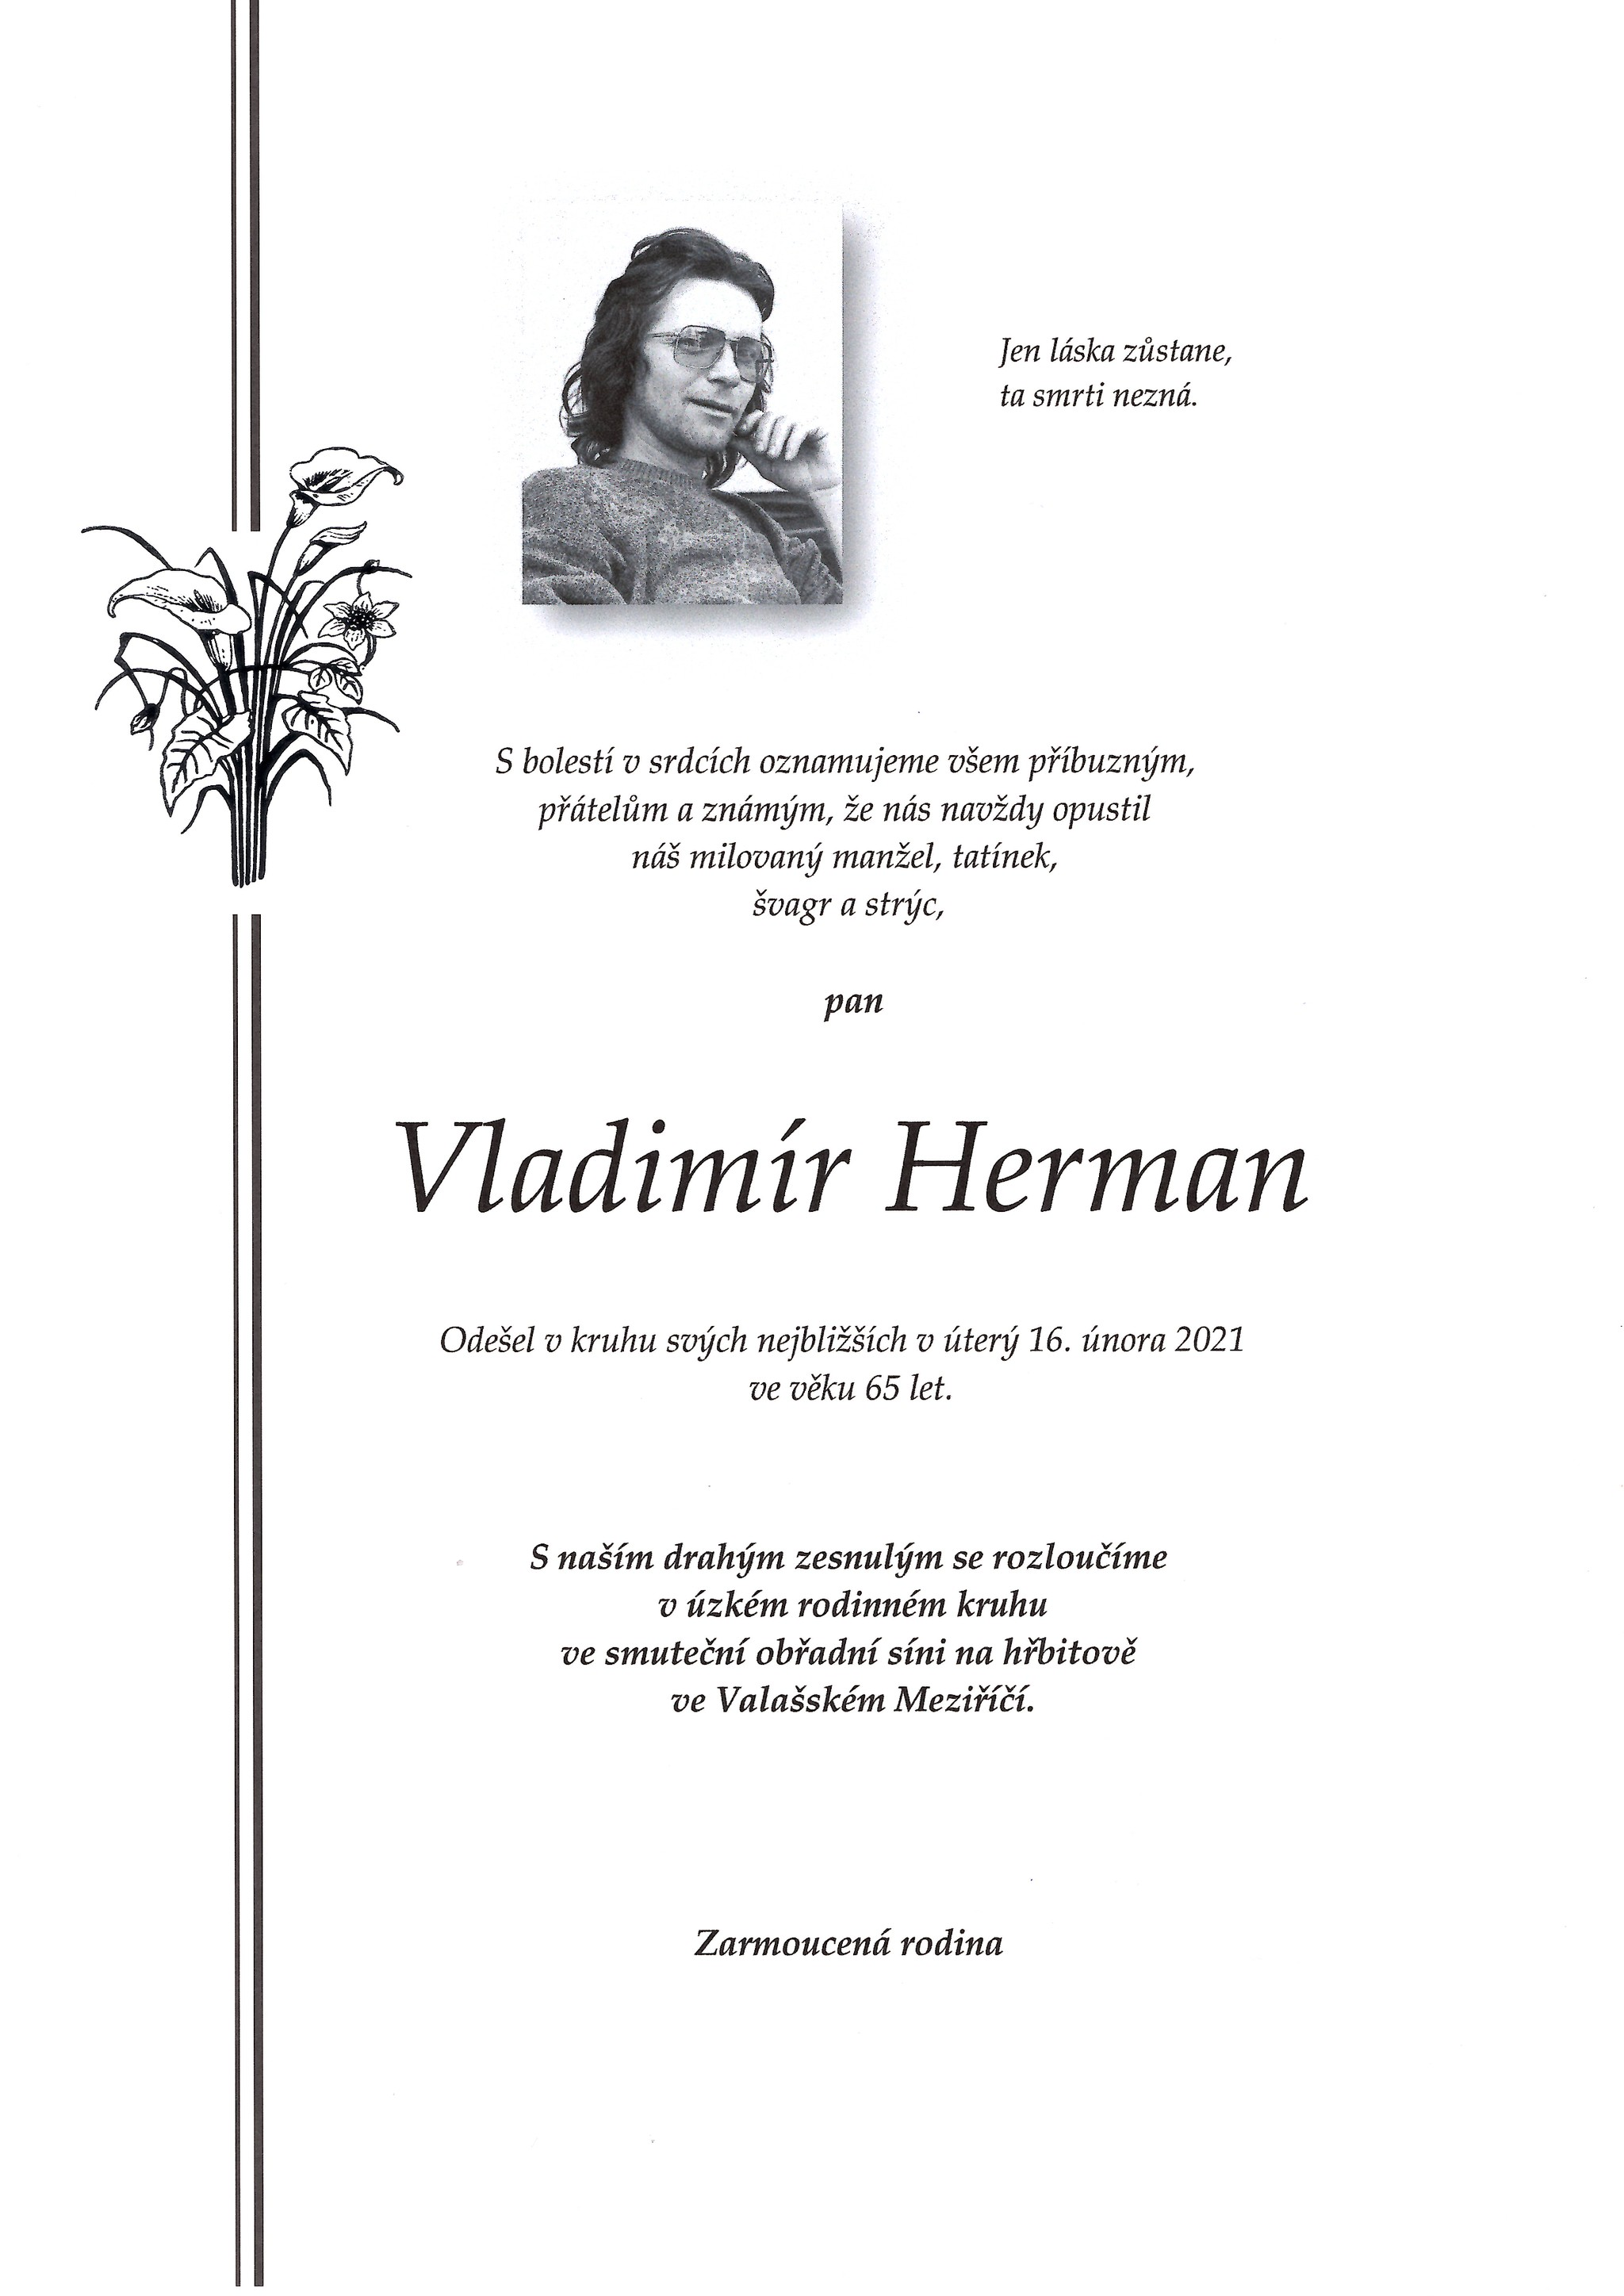 Vladimír Herman